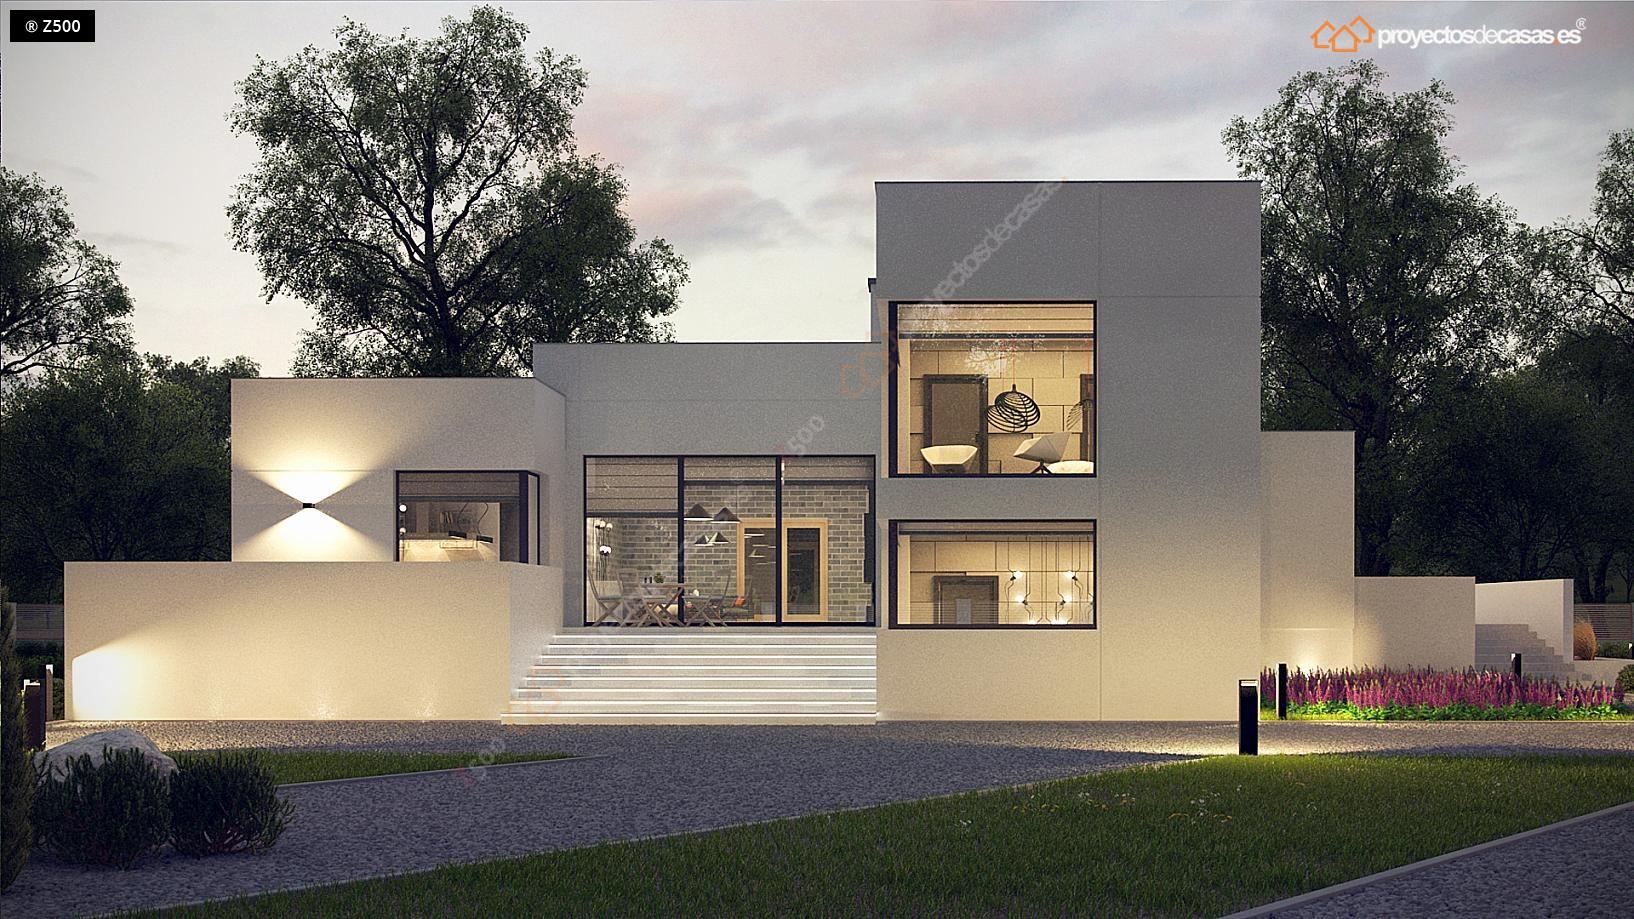 Proyectosdecasas dise amos y construimos casas en toda for Casas modernas unifamiliares